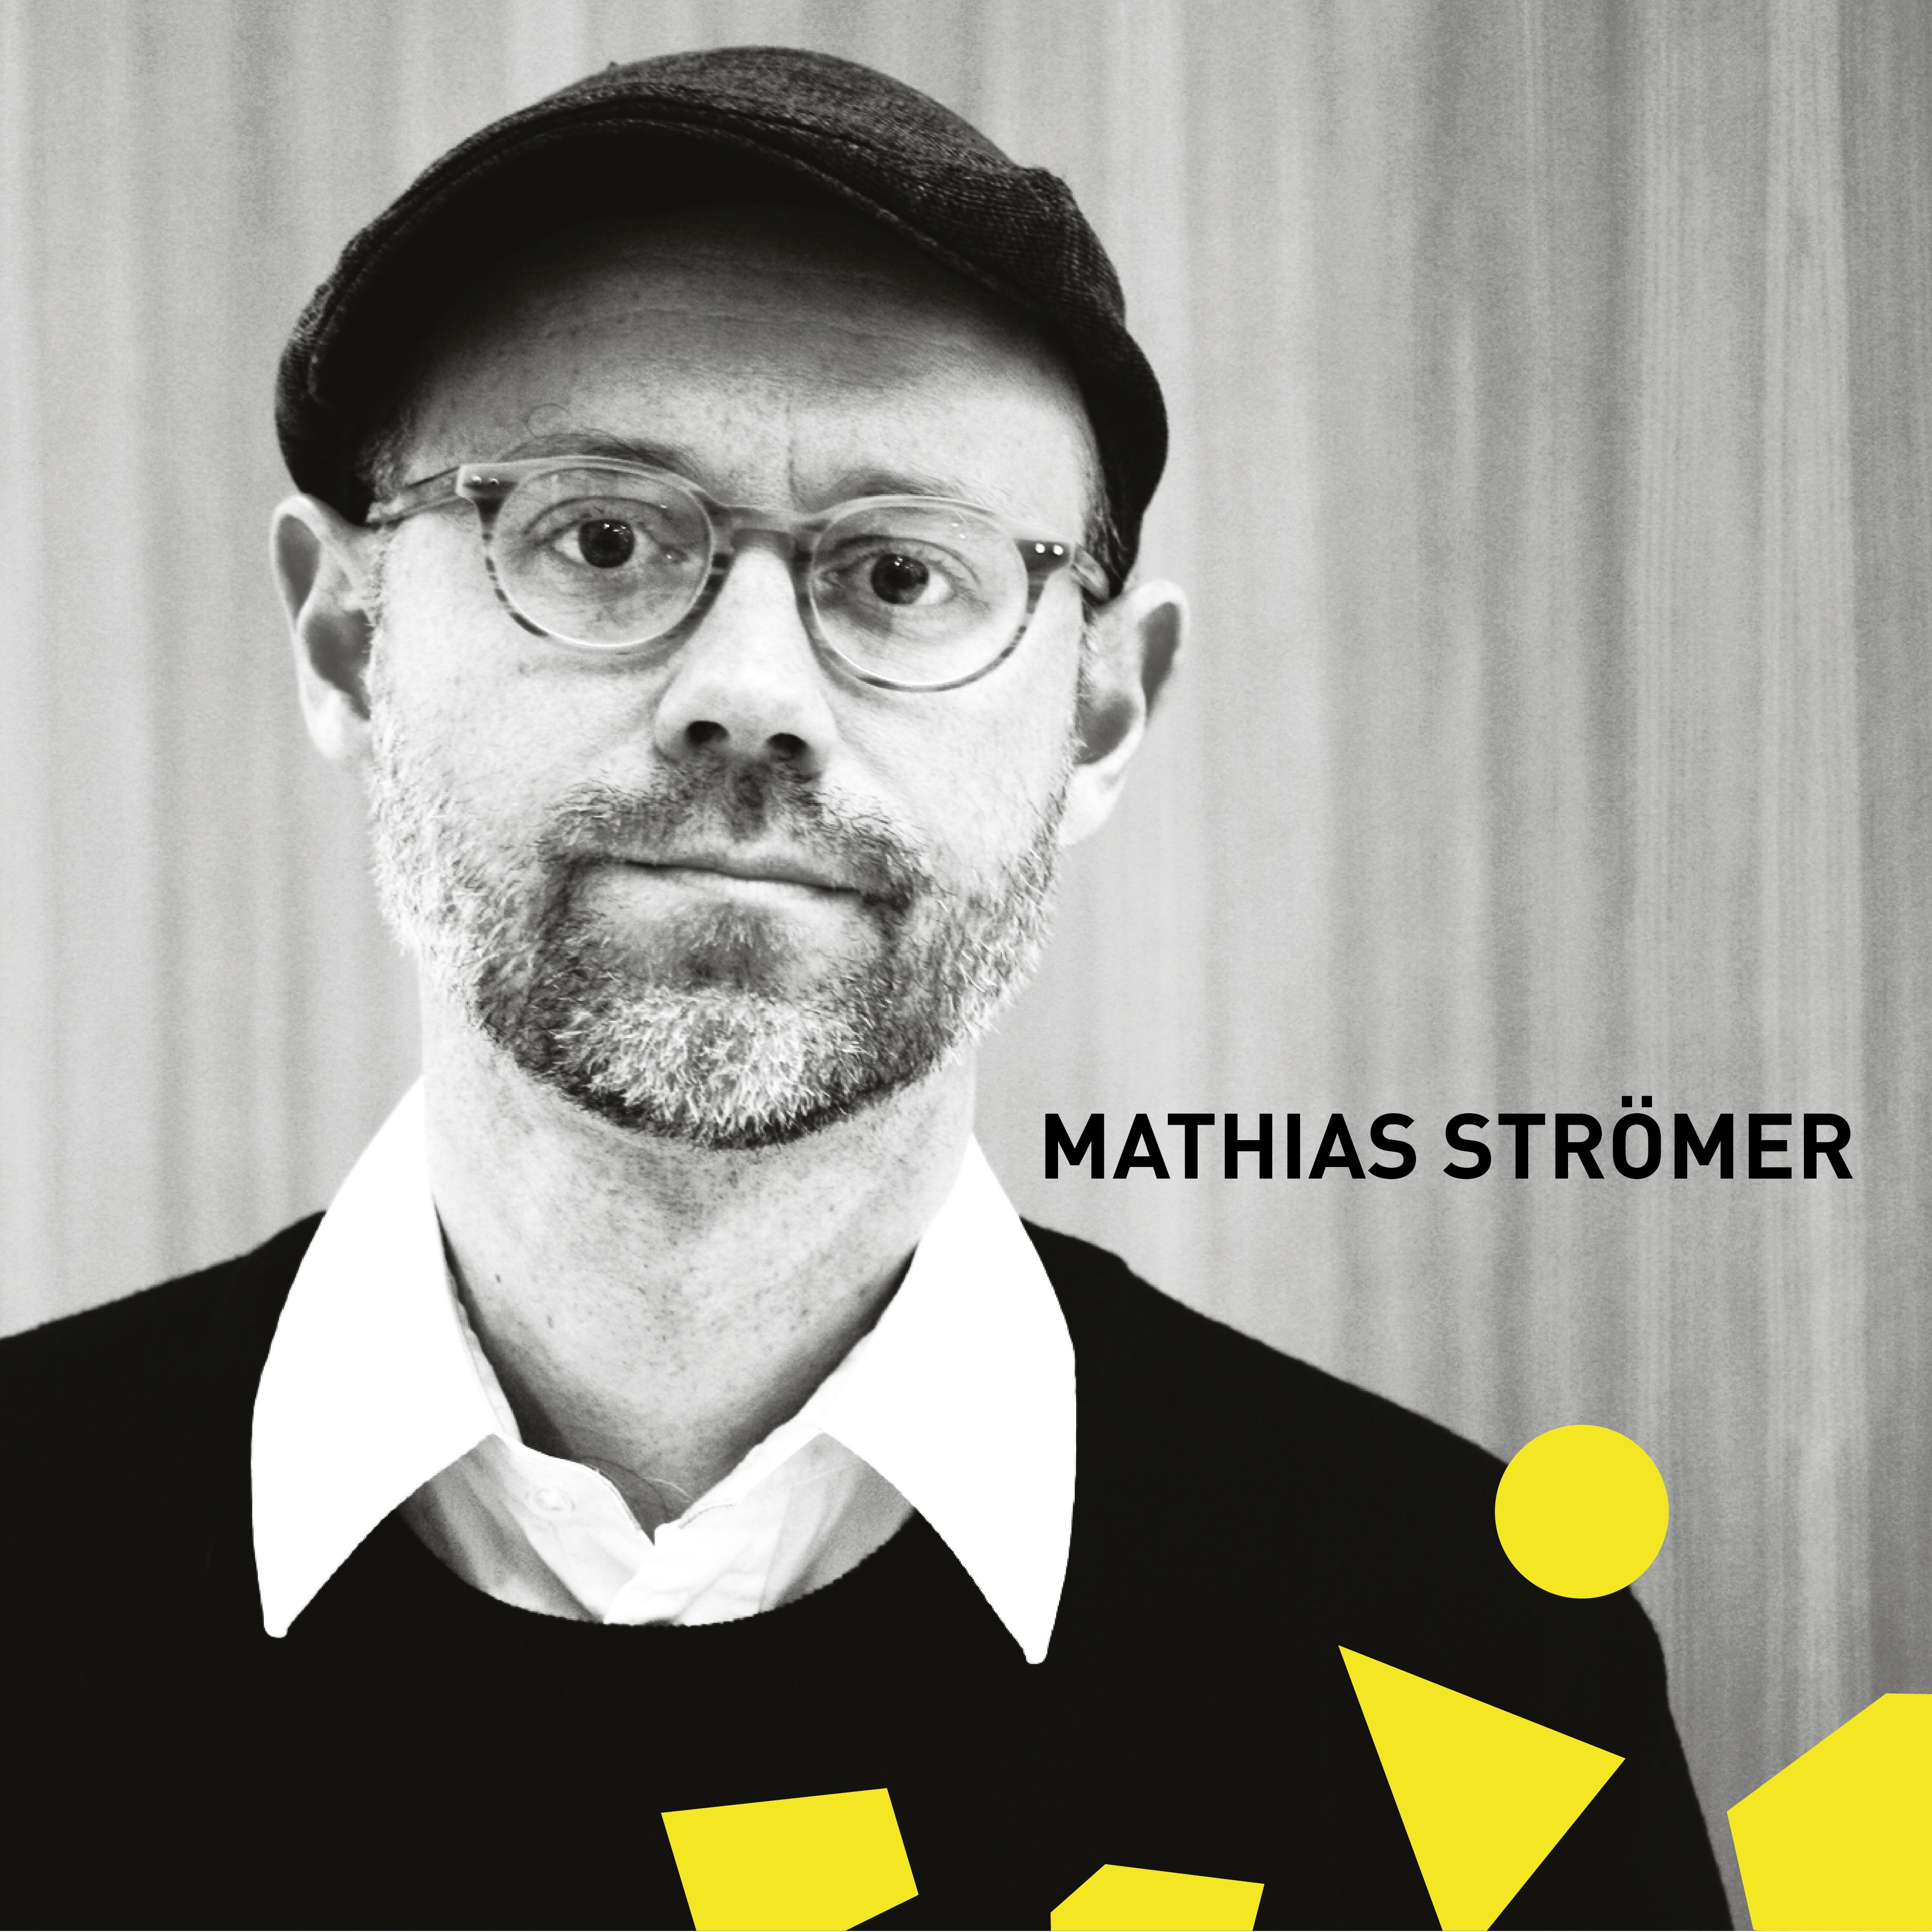 Mathias Strömer